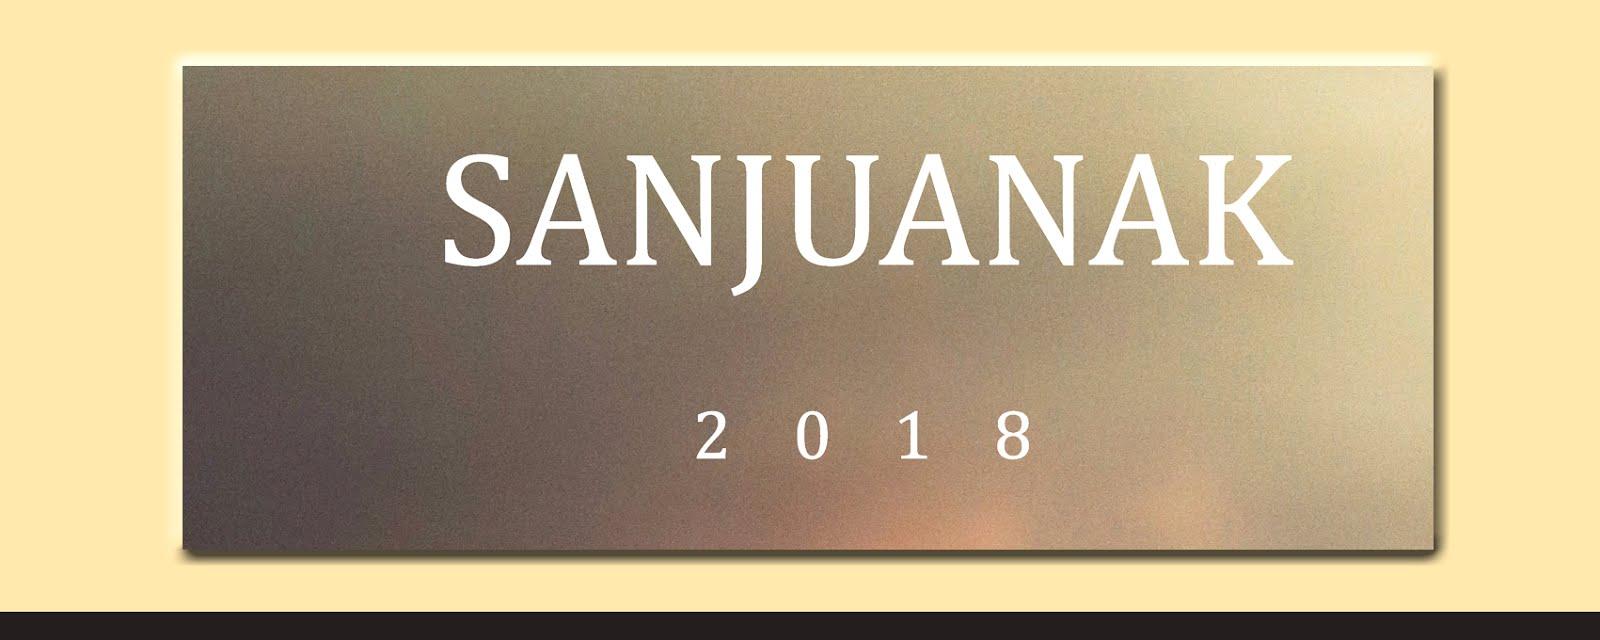 Sanjuanak 2018